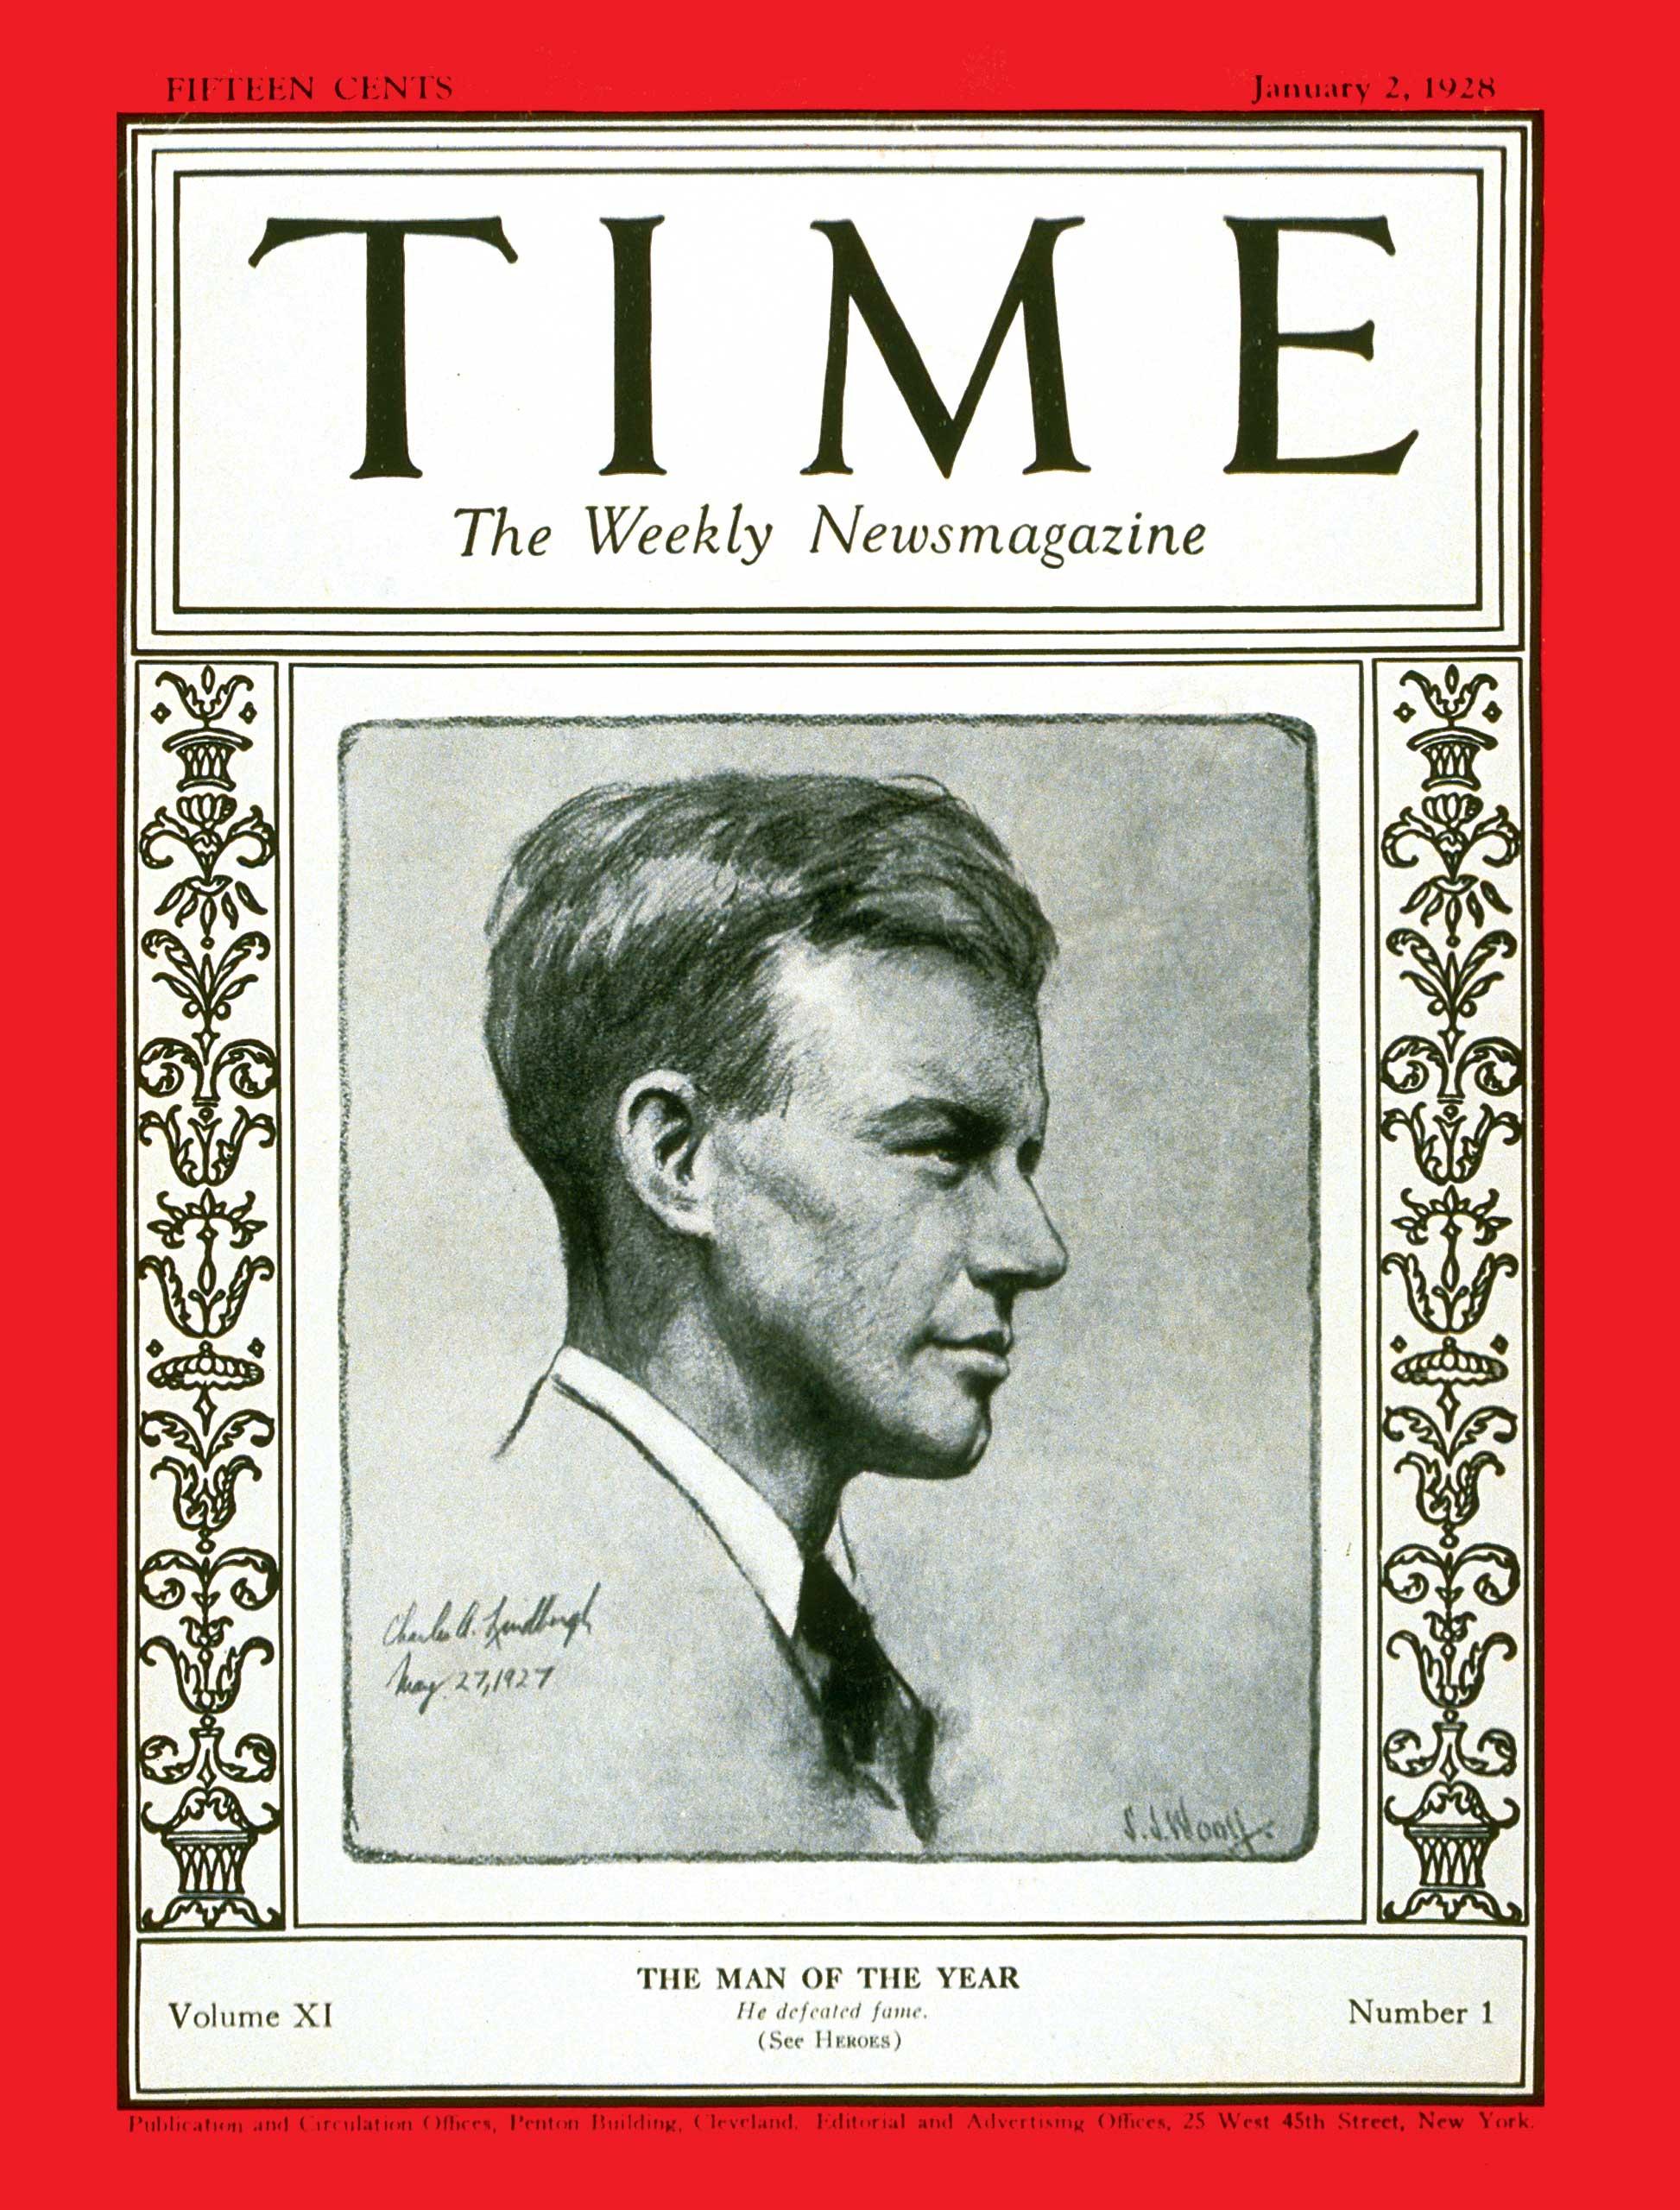 1927: Charles Lindbergh